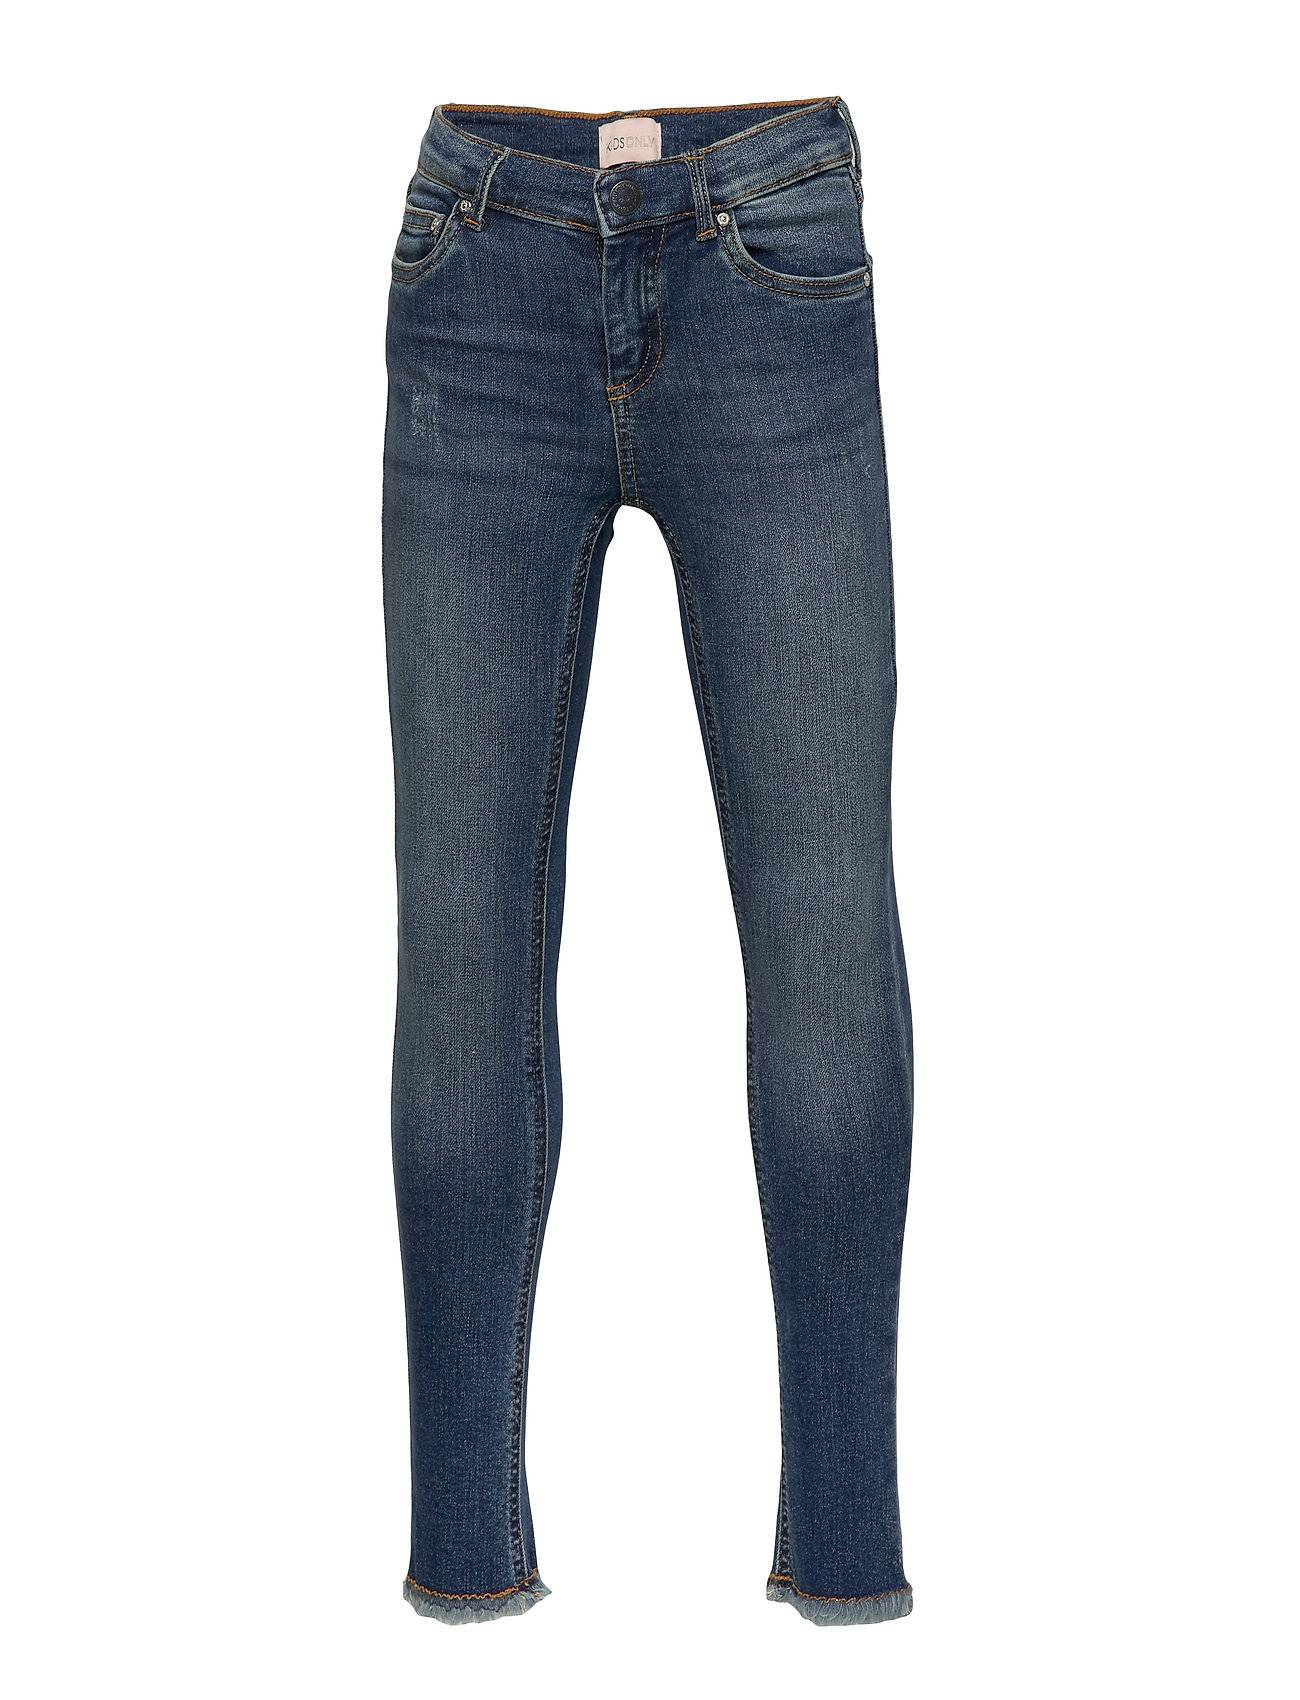 Kids Only Konblush Skinny Raw Jeans 1303 Noos Farkut Sininen Kids Only